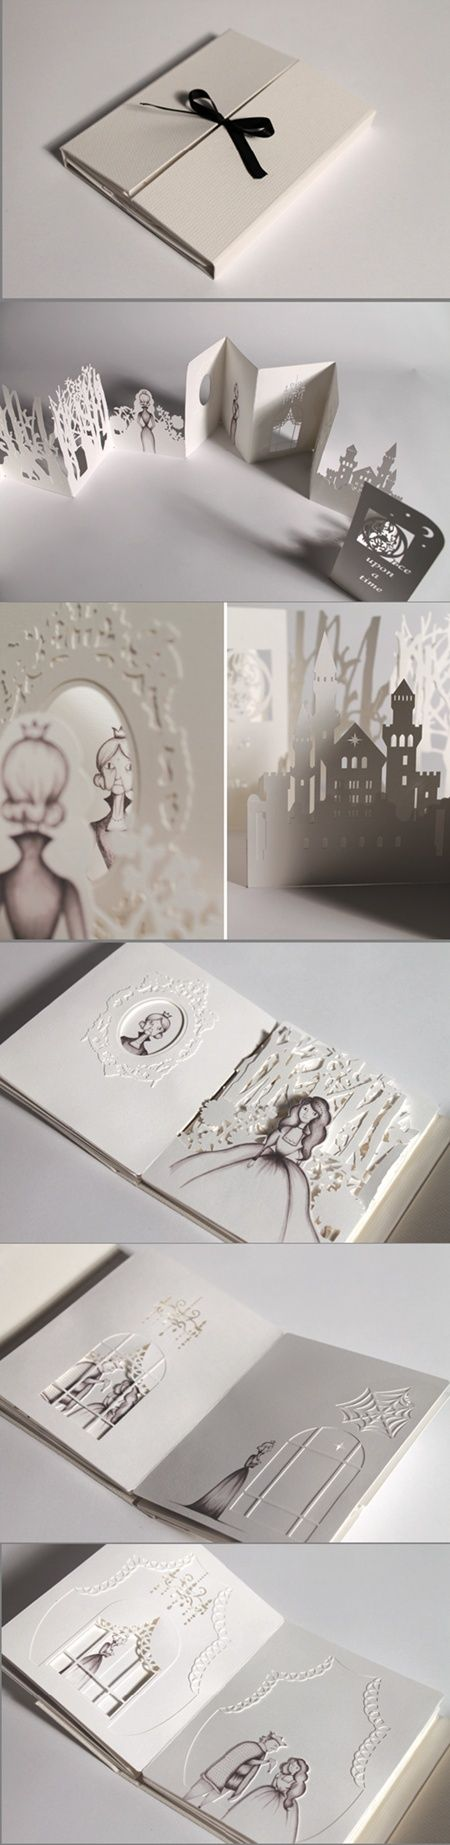 Hiroko Matshushita - a step up on the pop up book! #Paper Art #Paper Crafts